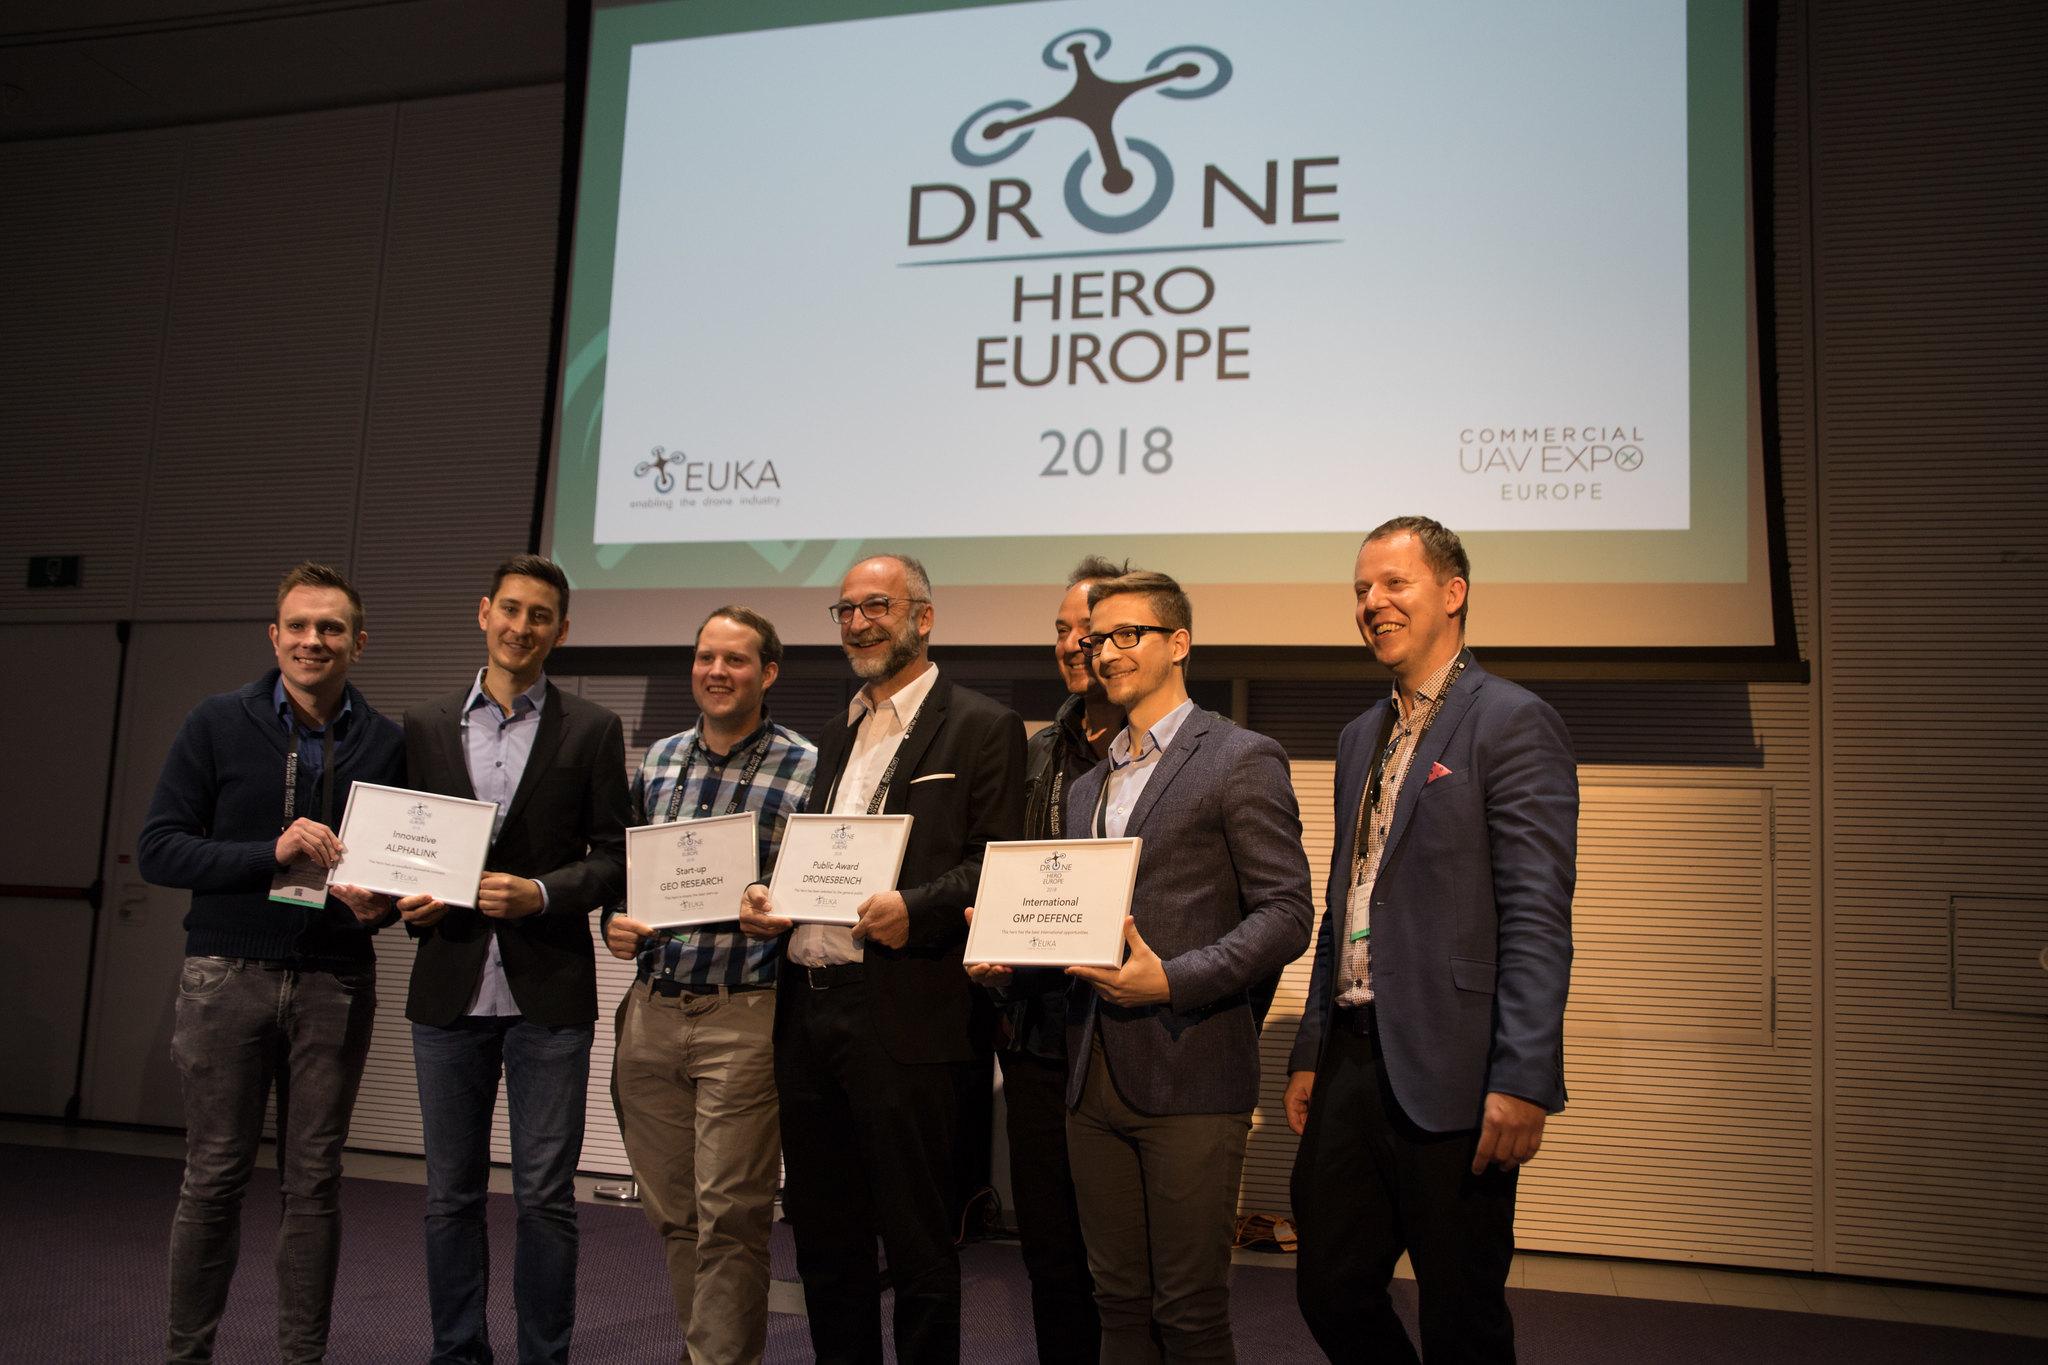 20180411 - Drone Hero Europe 2018